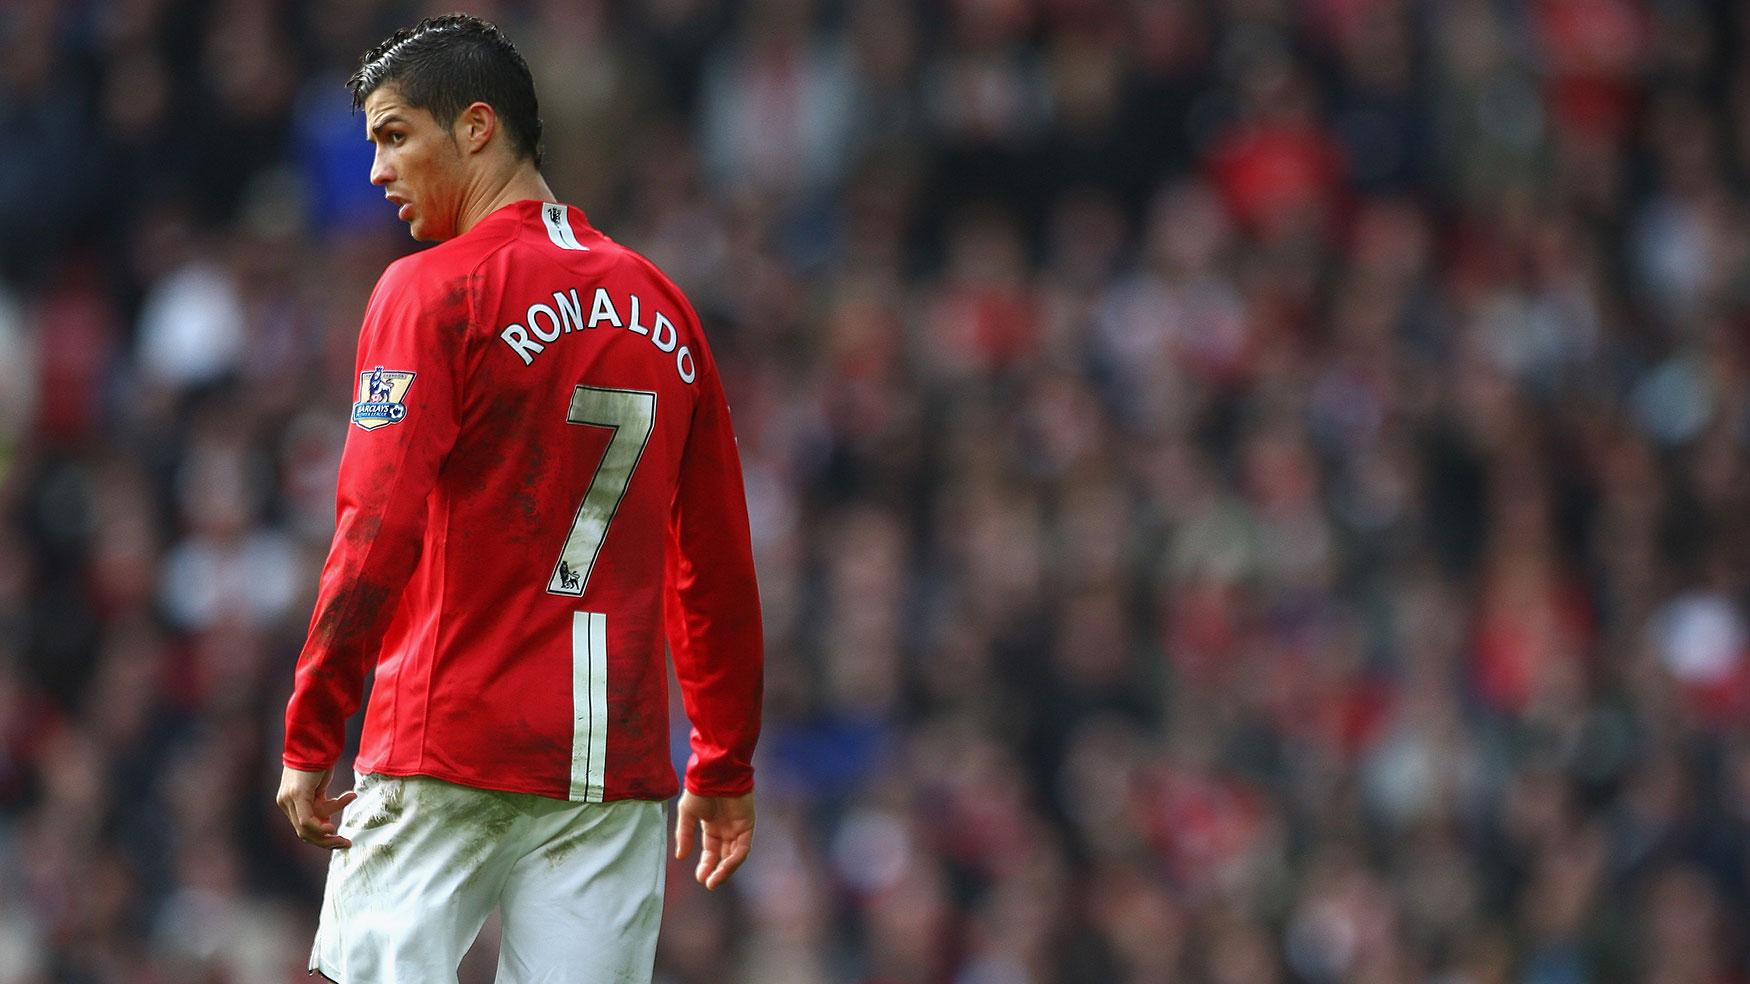 The Evolution Of Cristiano Ronaldo